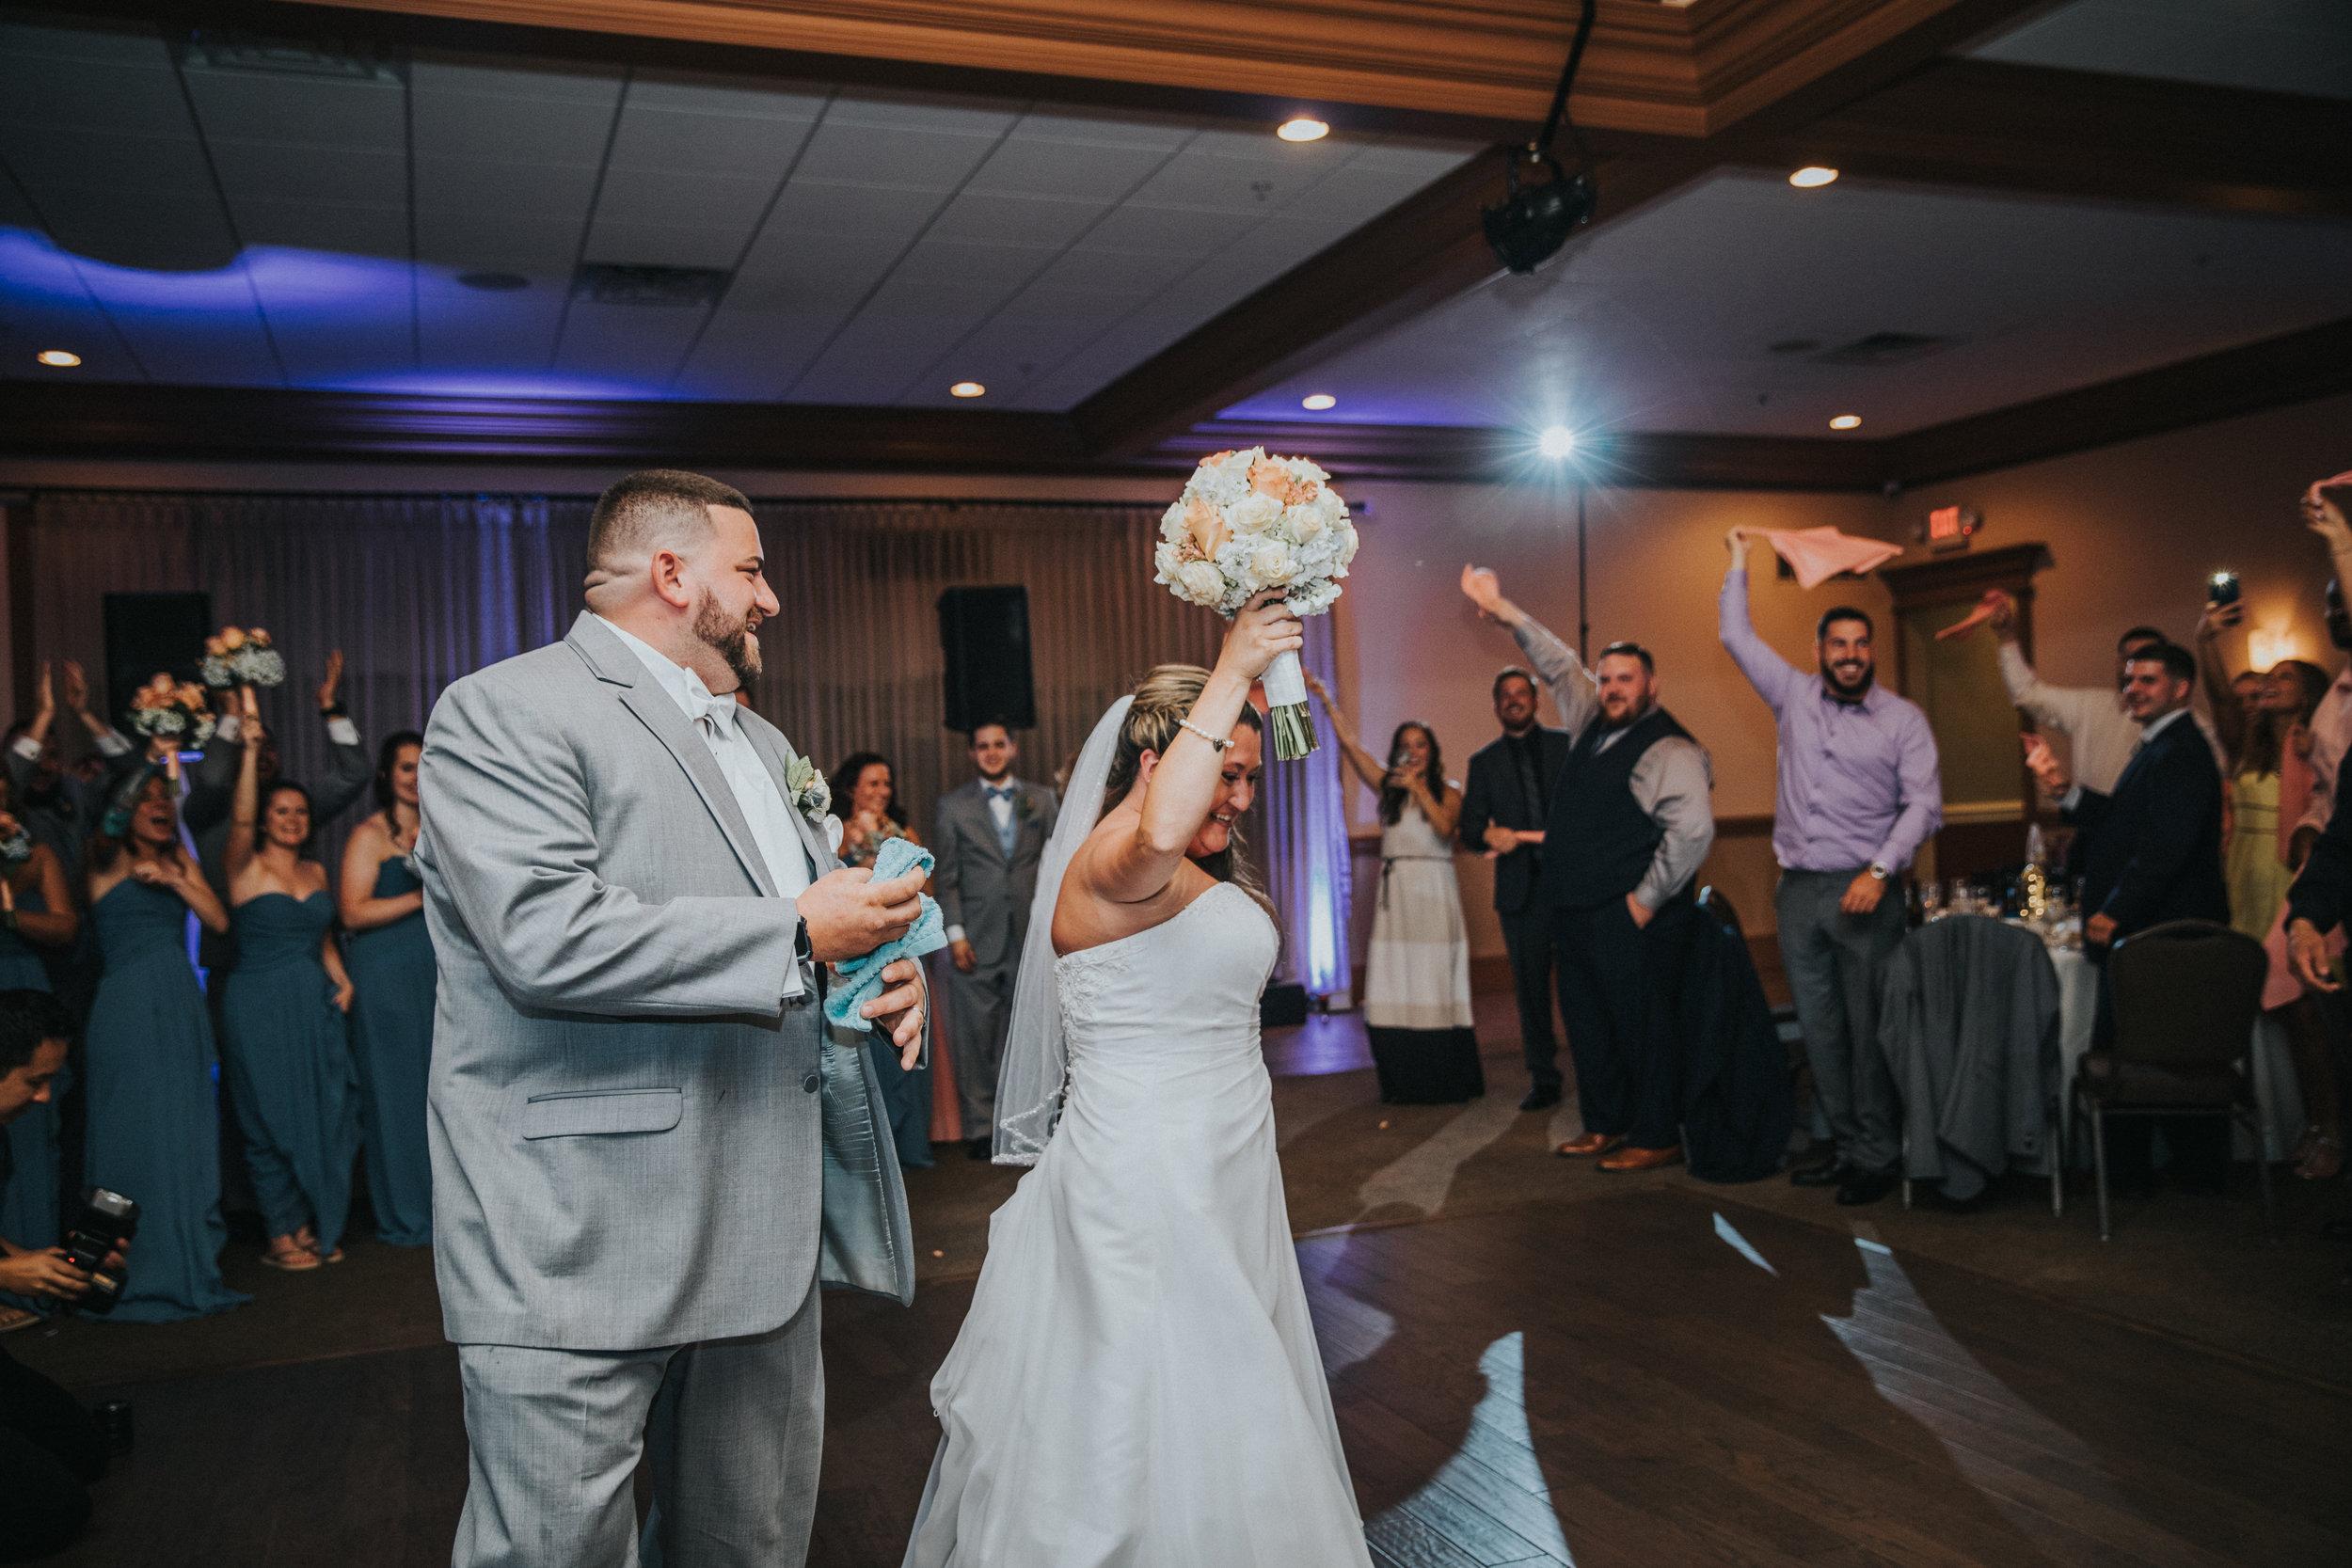 New-Jersey-Wedding-Photographer-JennaLynnPhotography-ValenzanoWinery-Reception-30.jpg